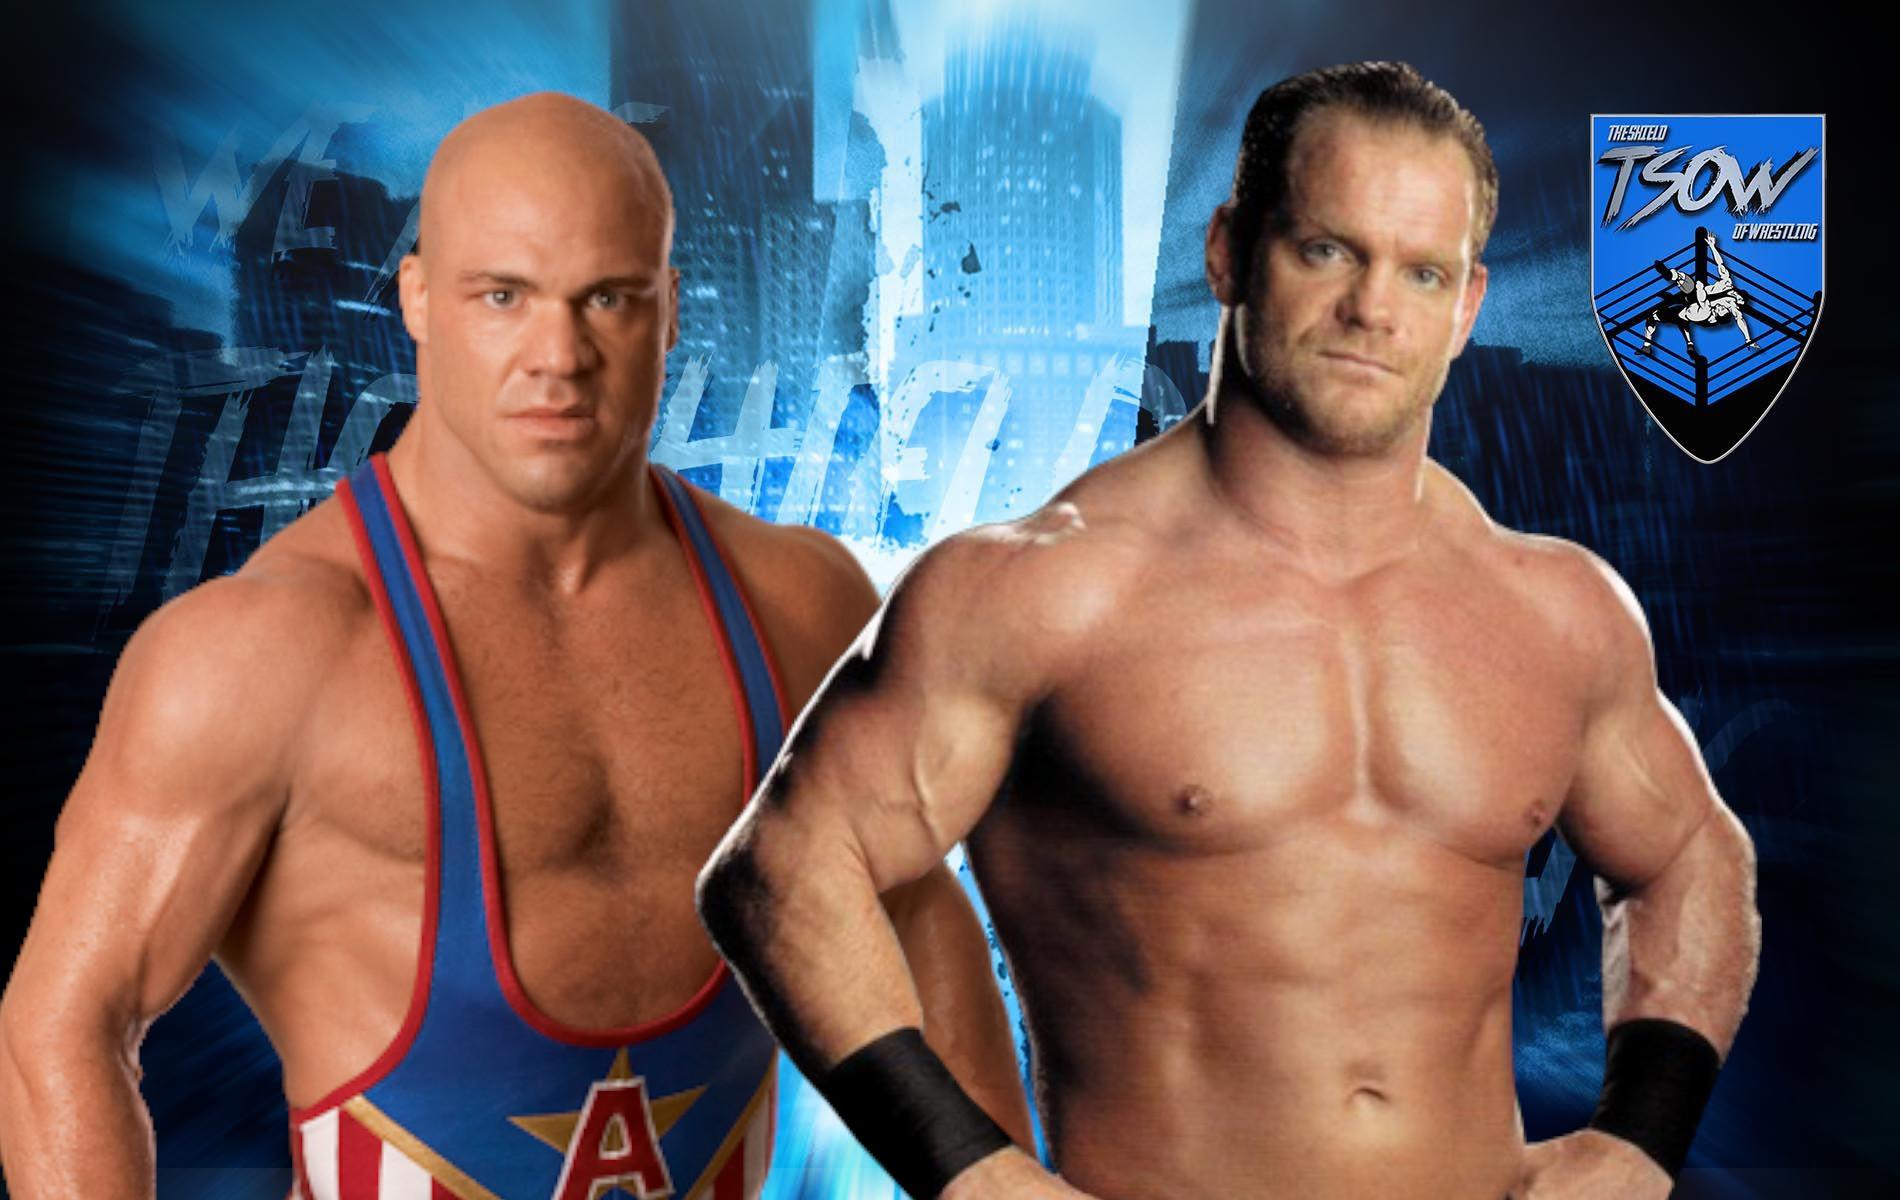 Chris Benoit e Kurt Angle misero paura a Steve Austin